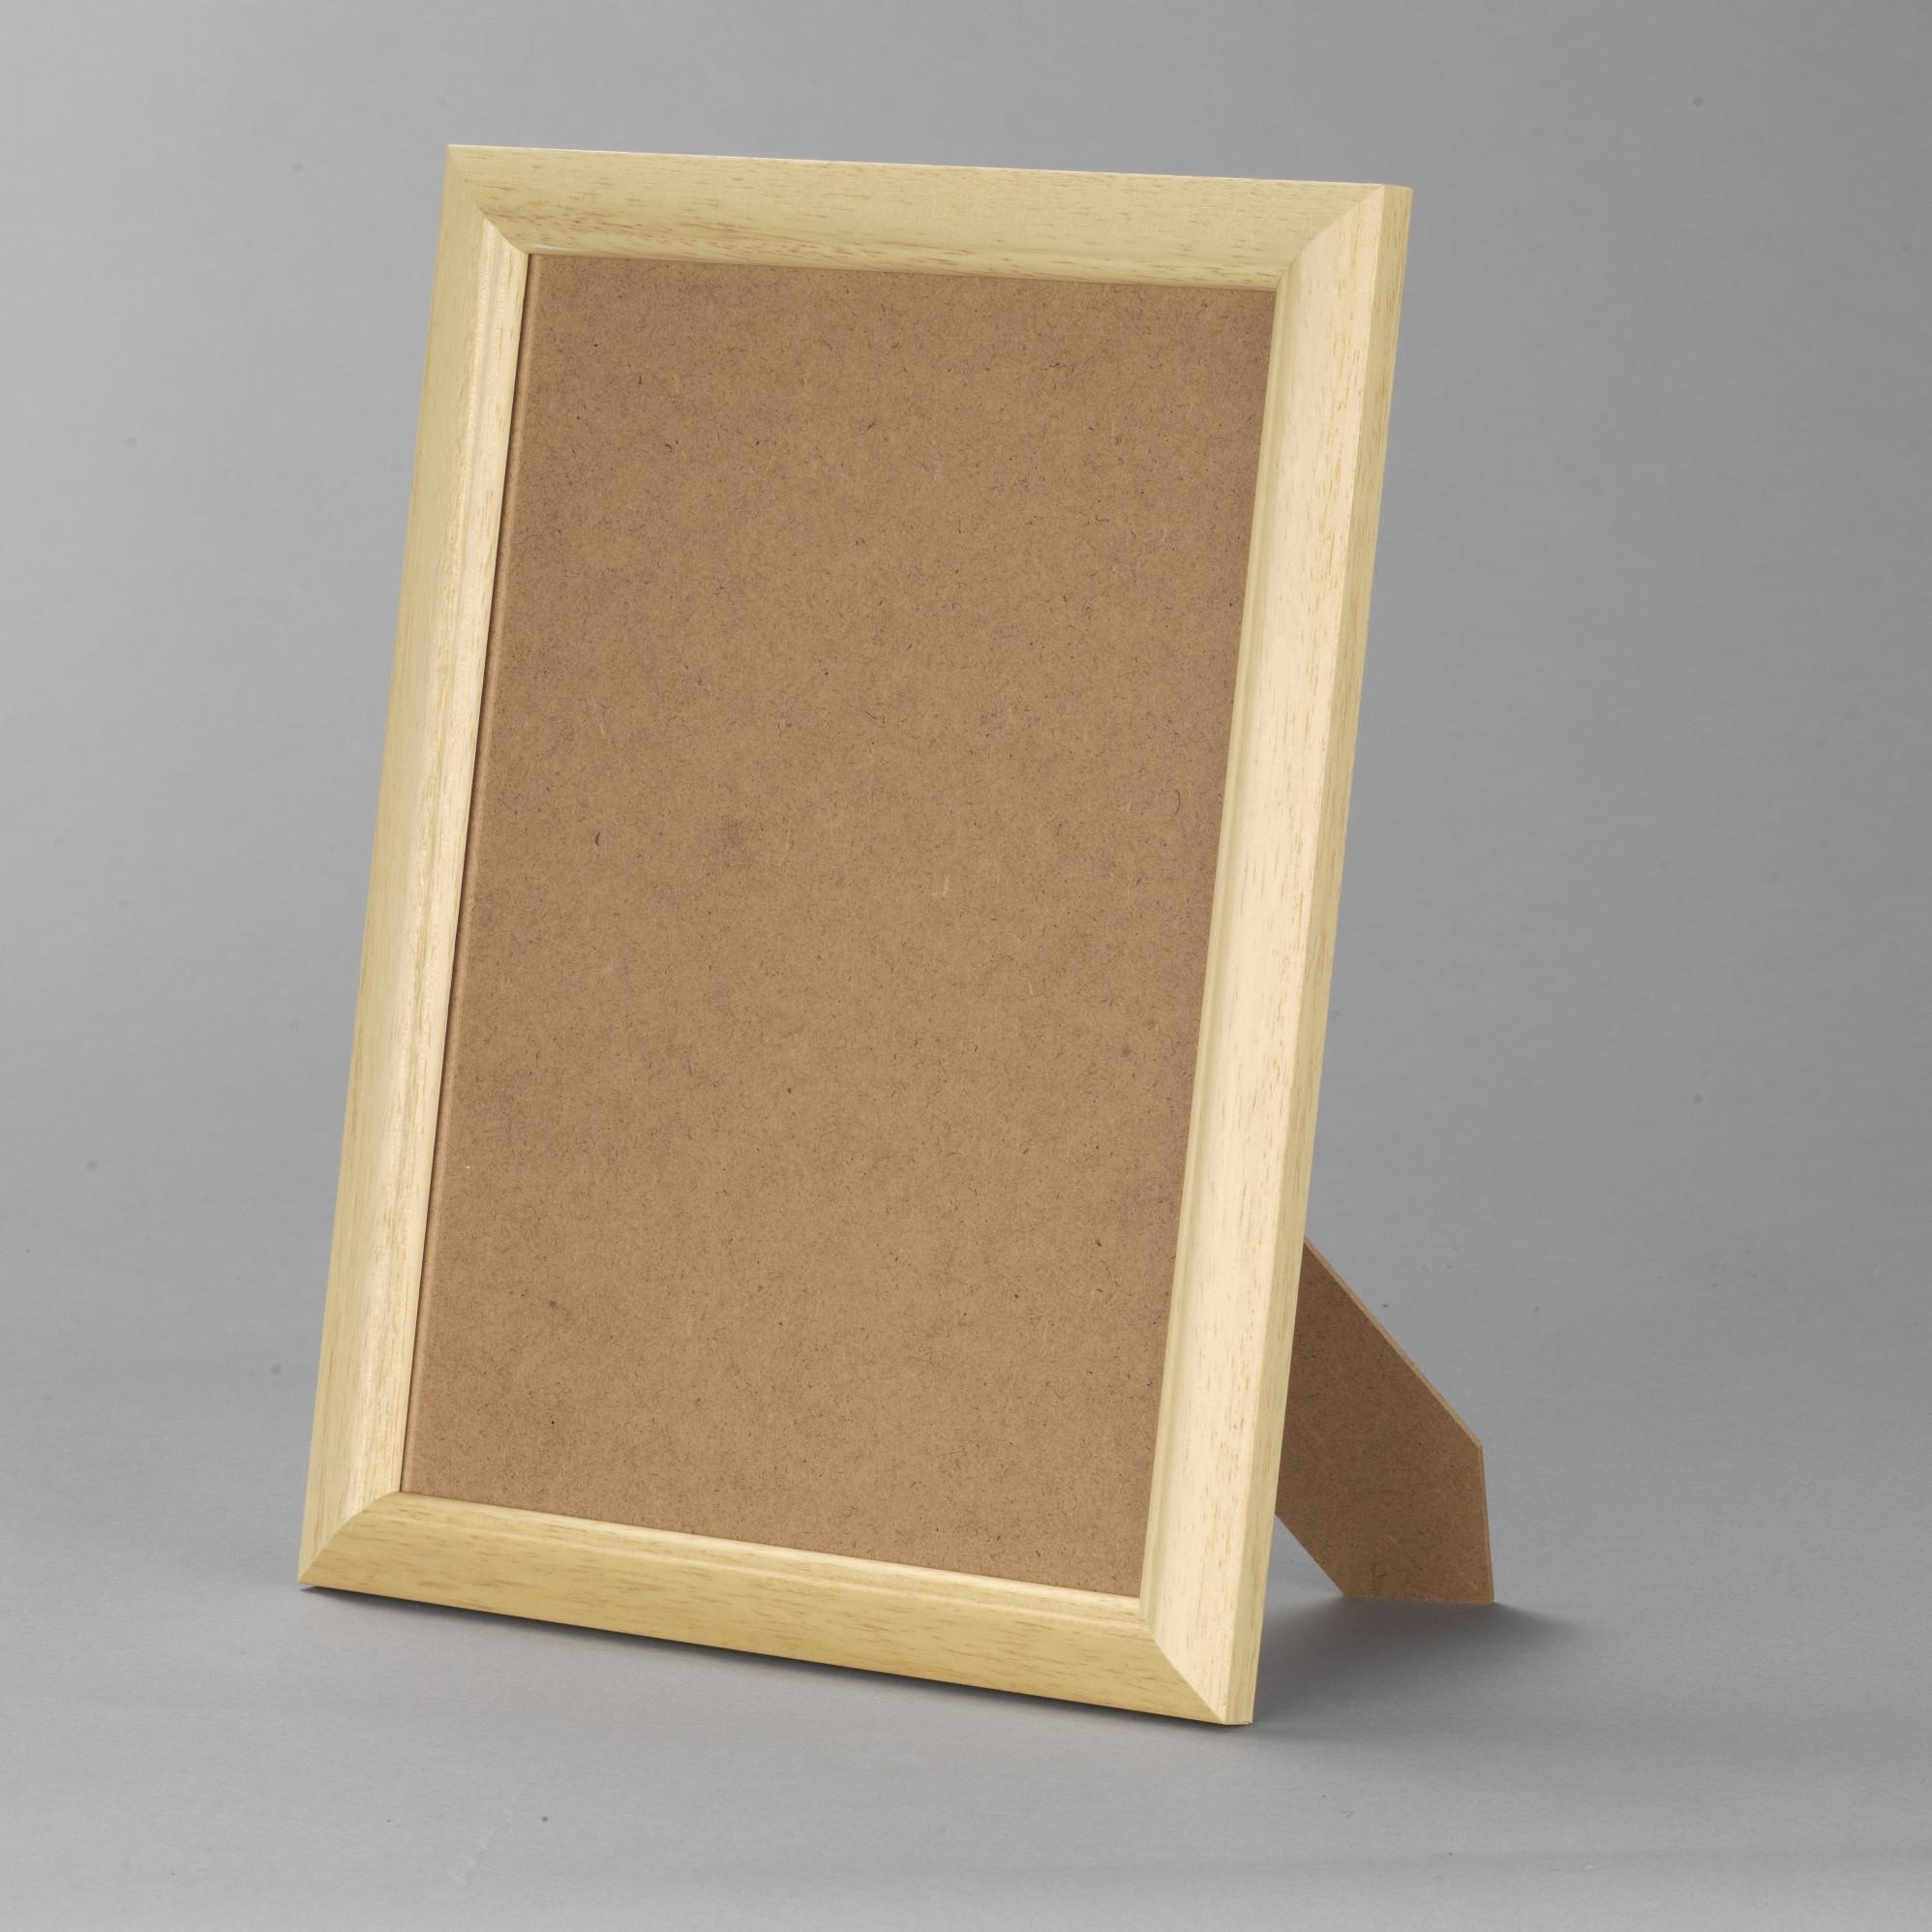 cadre bois naturel 21x29 7 pas cher cadre photo bois naturel 21x29 7 destock cadre. Black Bedroom Furniture Sets. Home Design Ideas